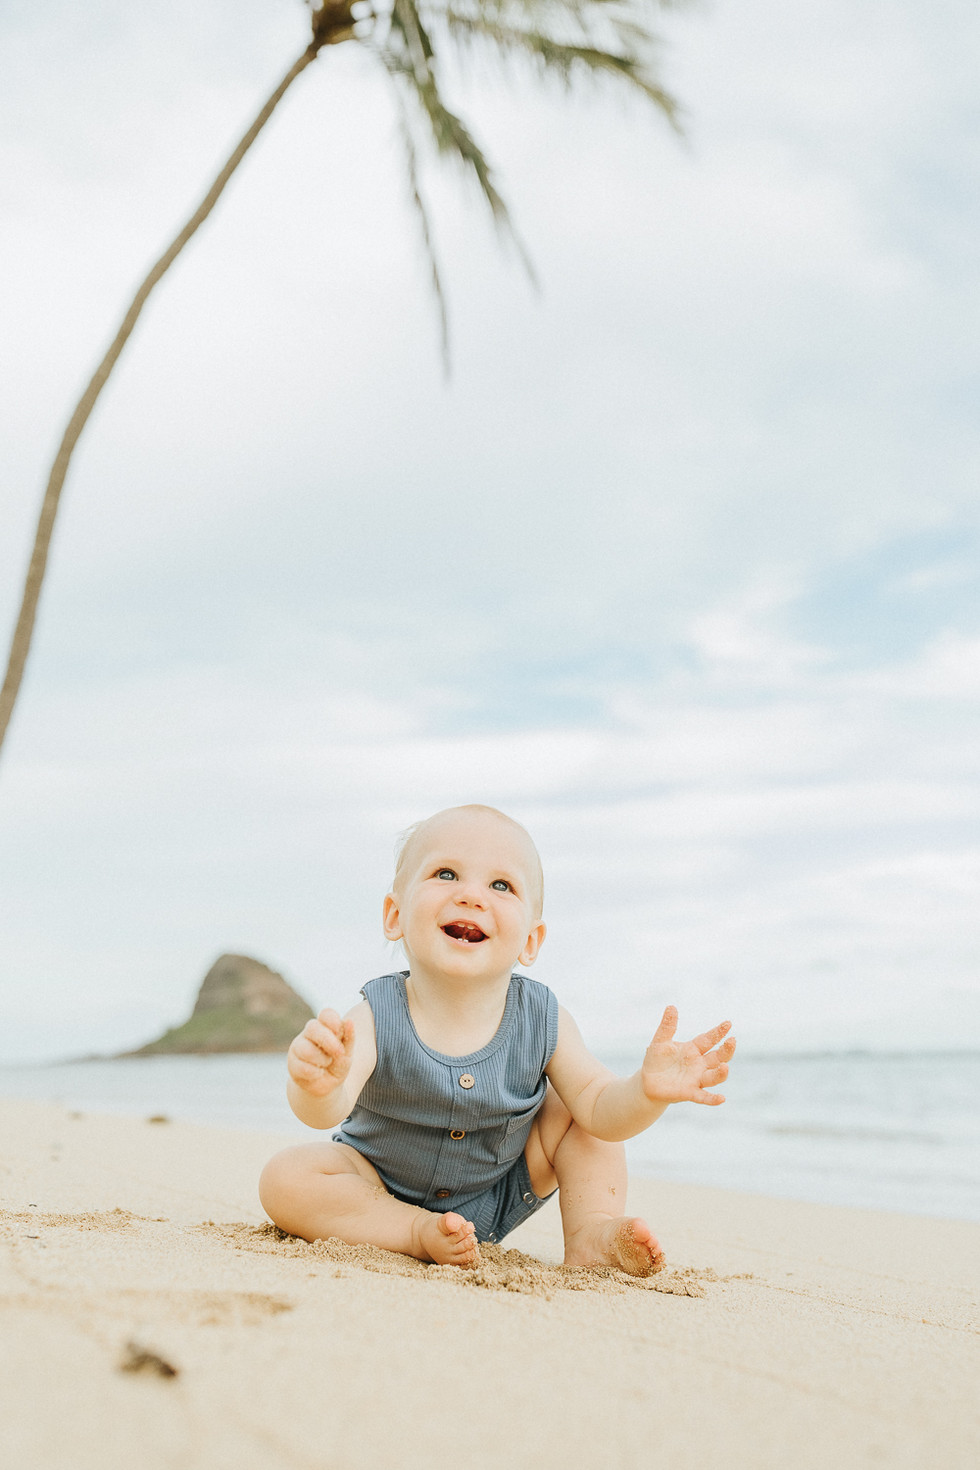 Family Beach Photo Session at Kualoa Beach on Oahu | Oahu Family Photographer